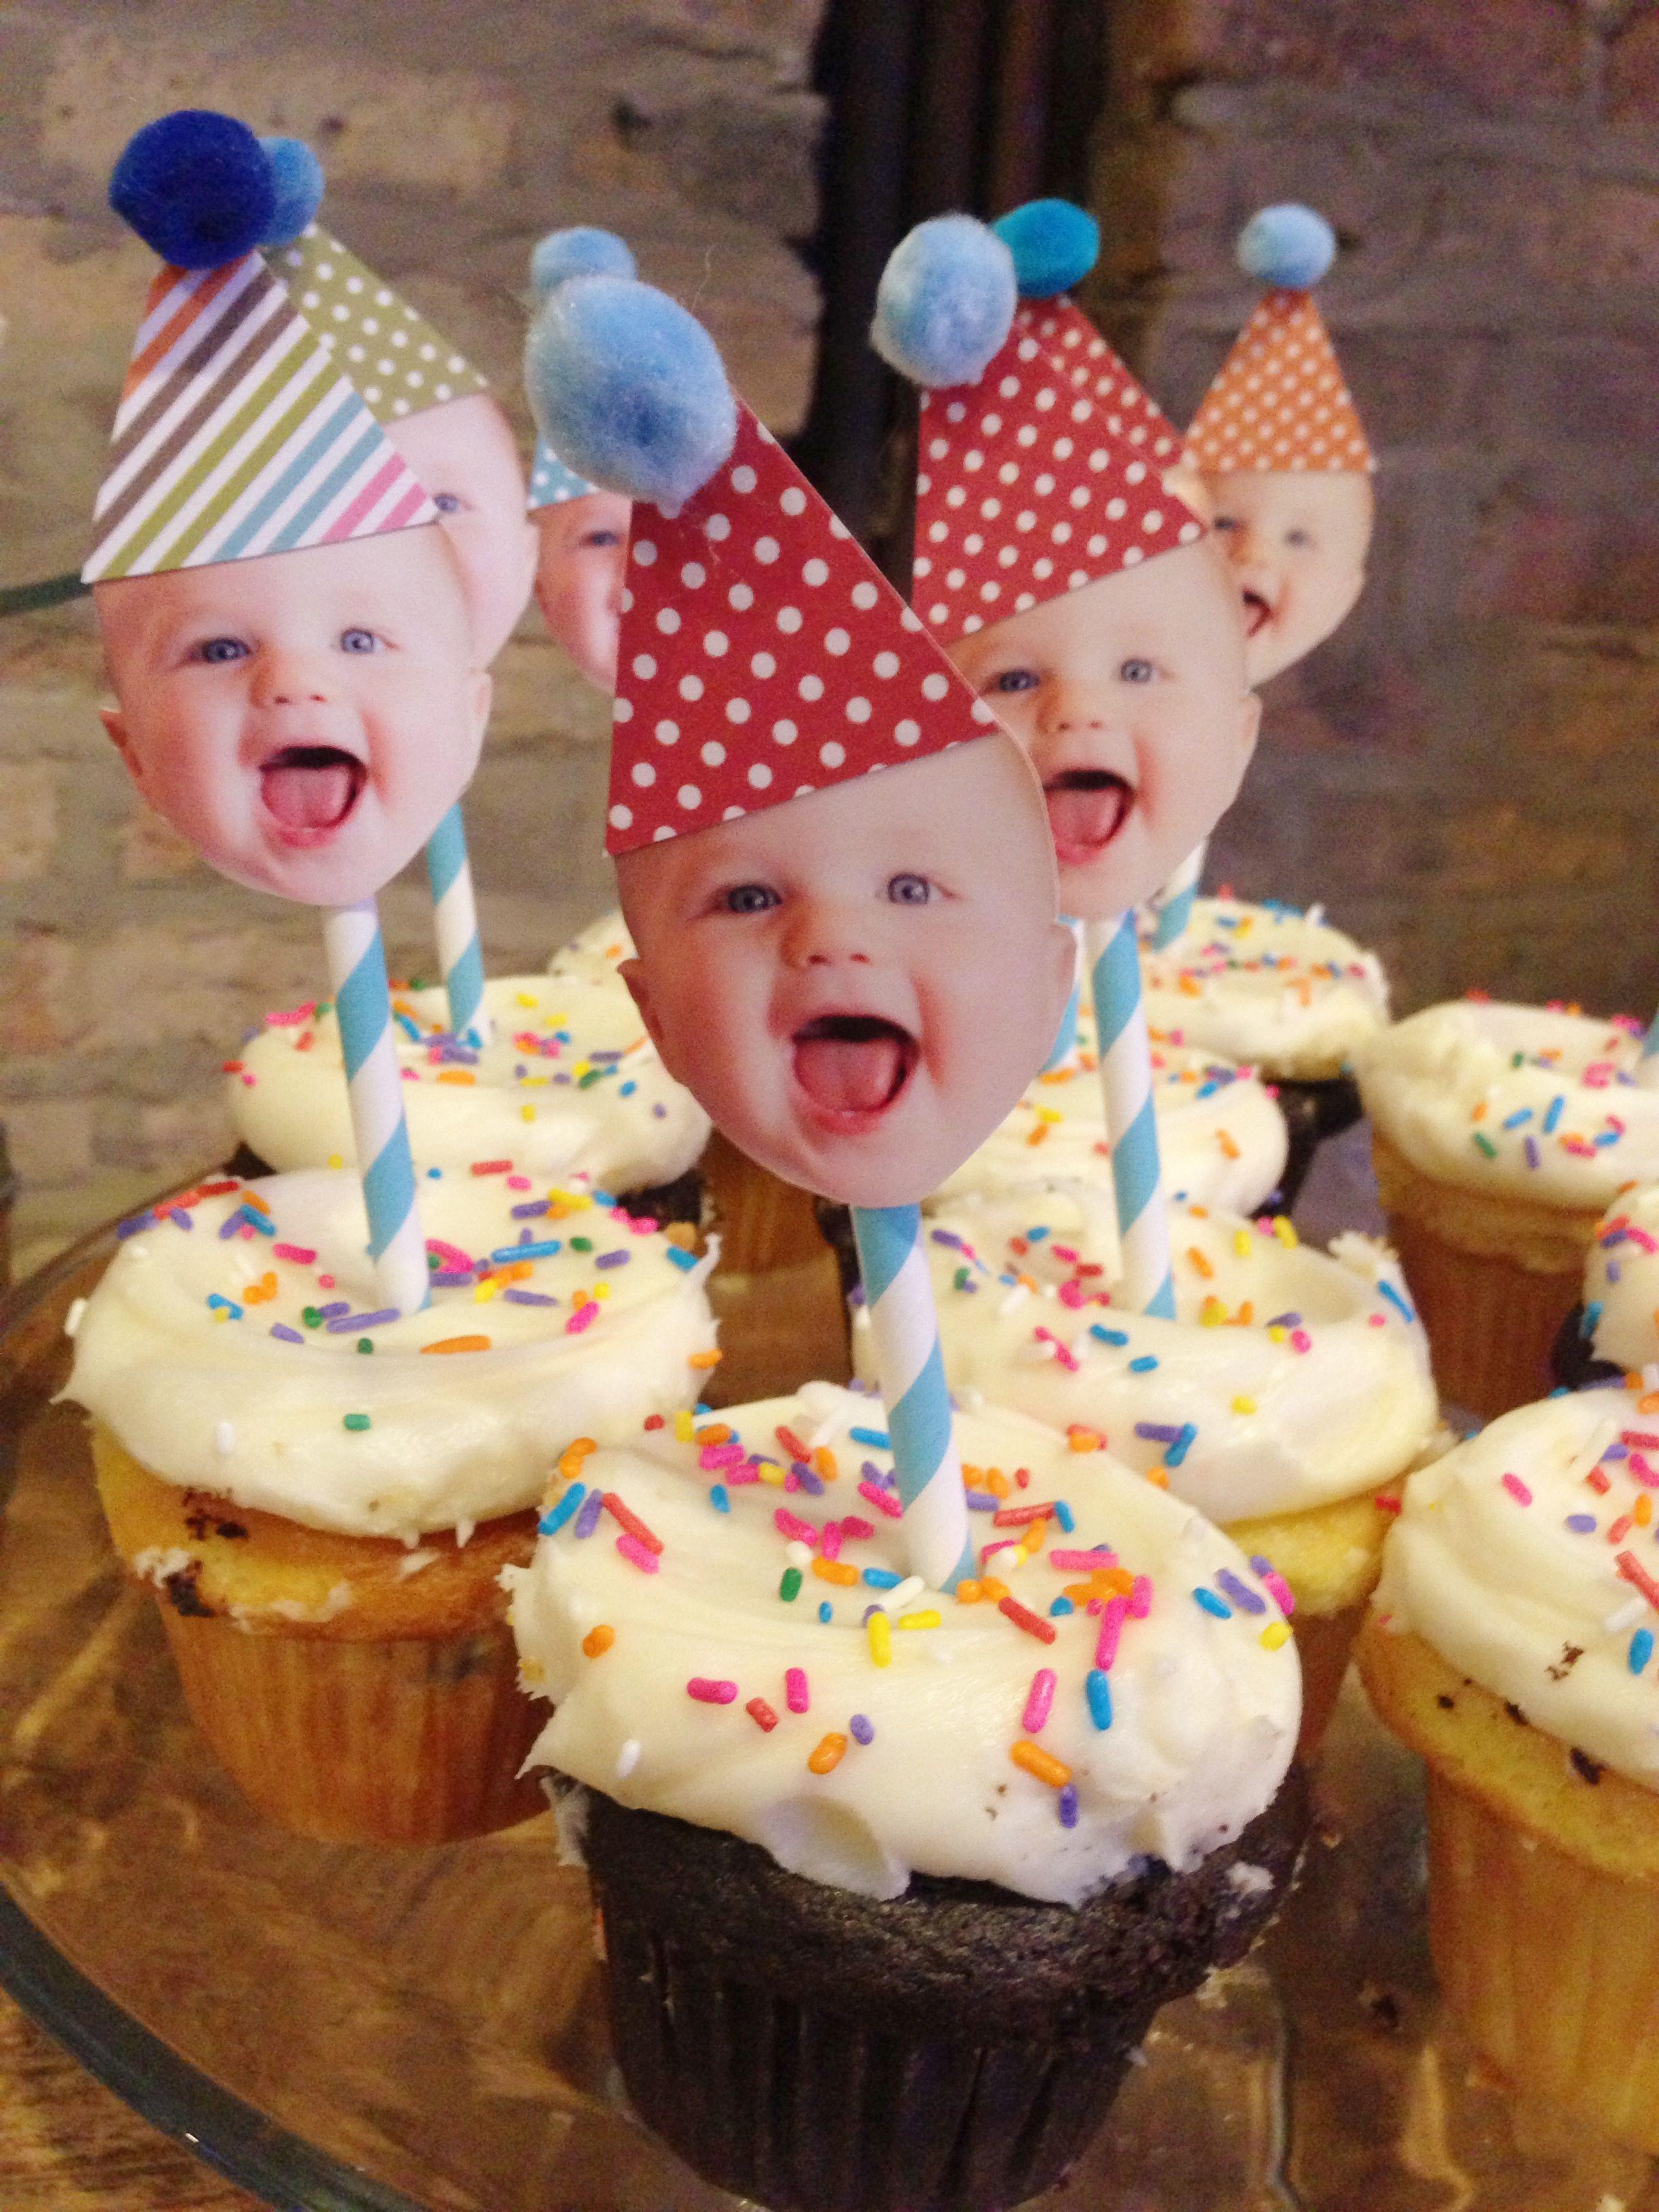 Ideen Geburtstagsfeier Erwachsene  Easiest DIY Cupcake Toppers for a first birthday party